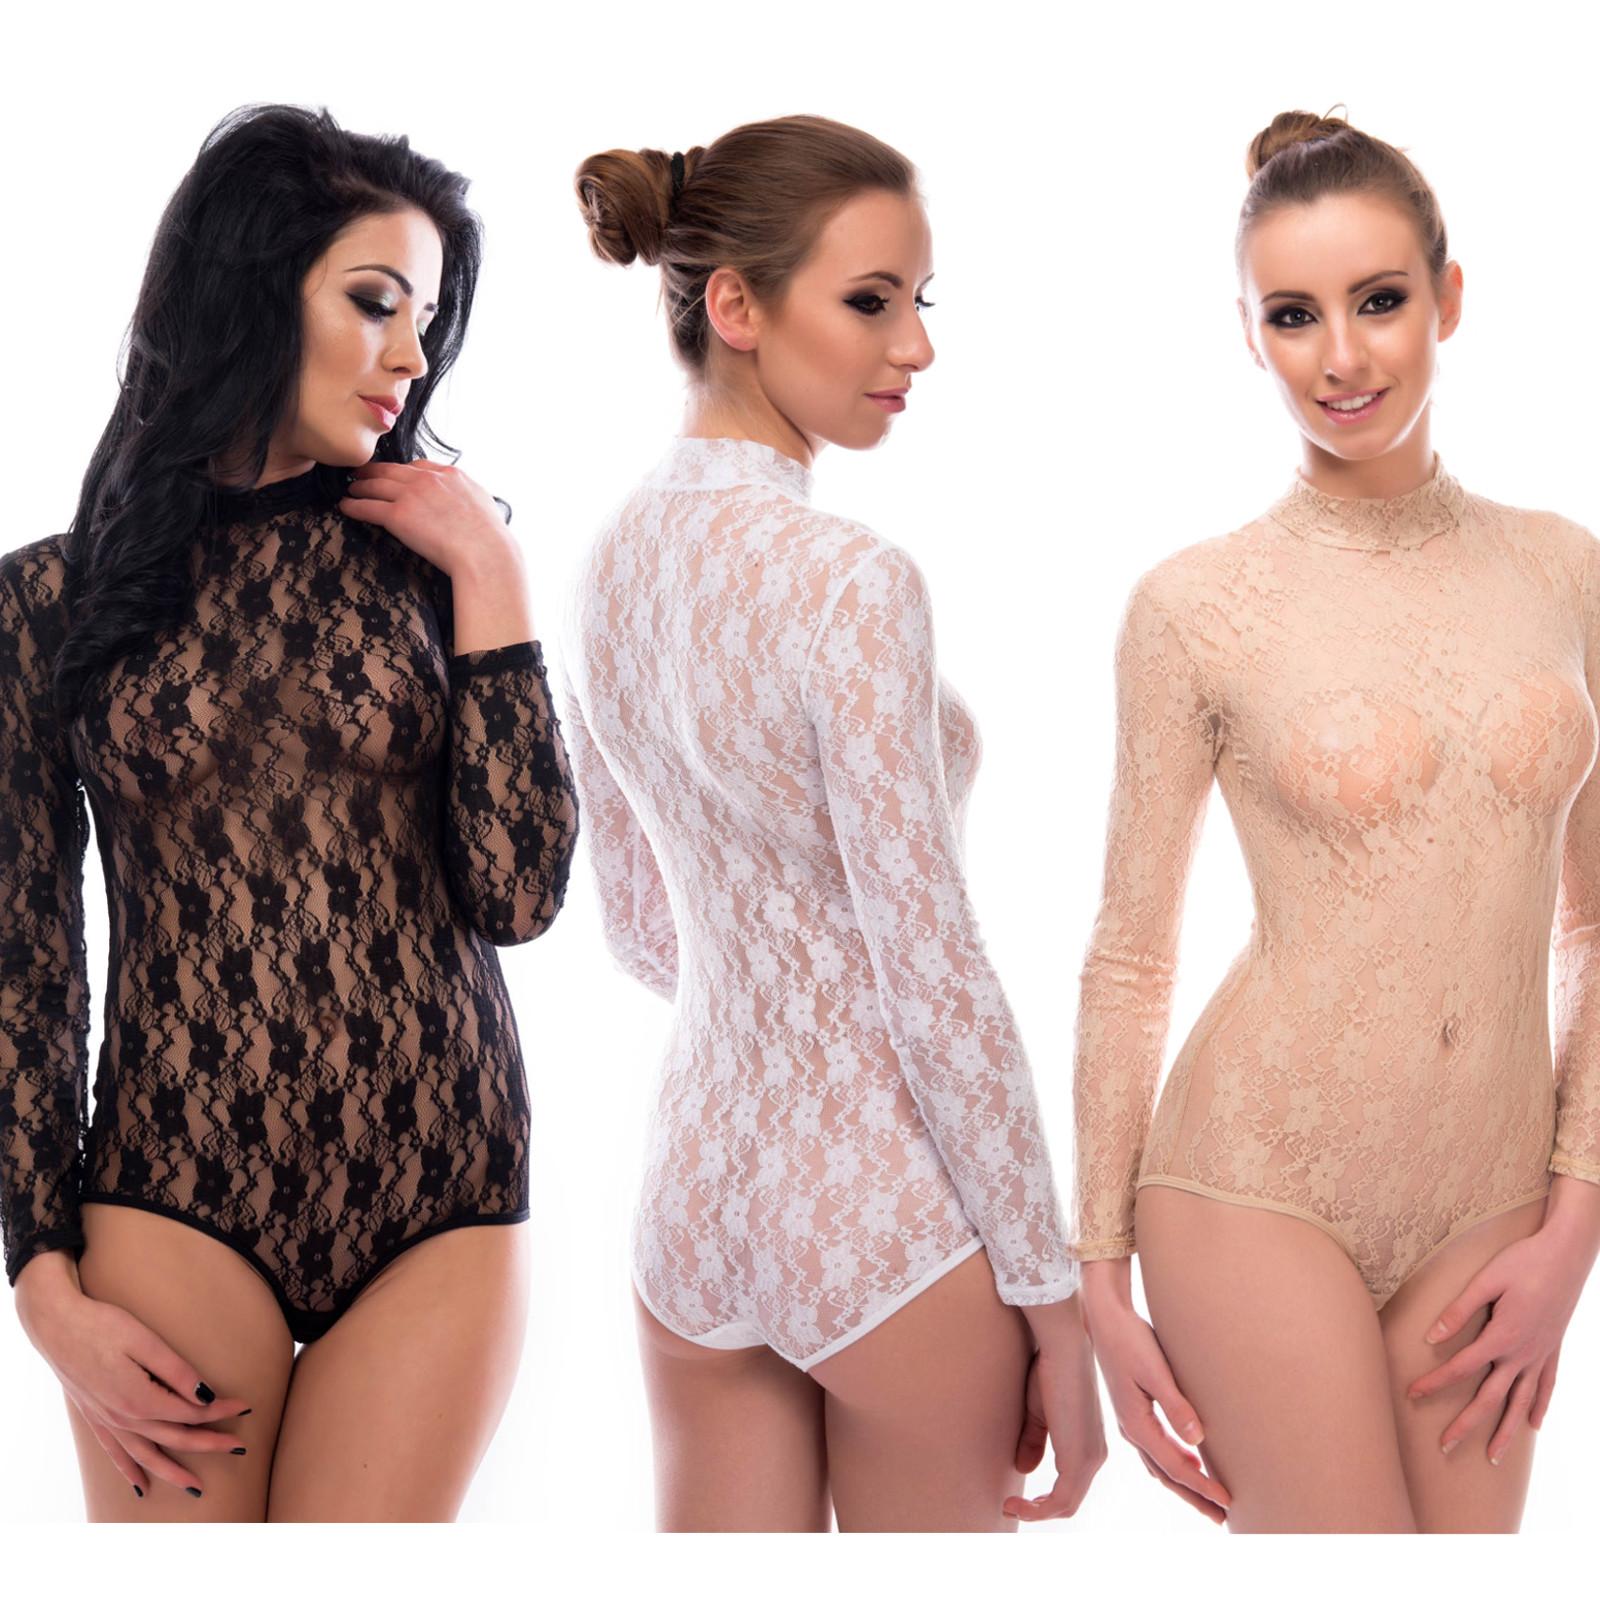 Langarmbody-Damen-Body-Stringbody-Sexy-Spitzenbody-Armellos-Halbkragen-Bodysuit